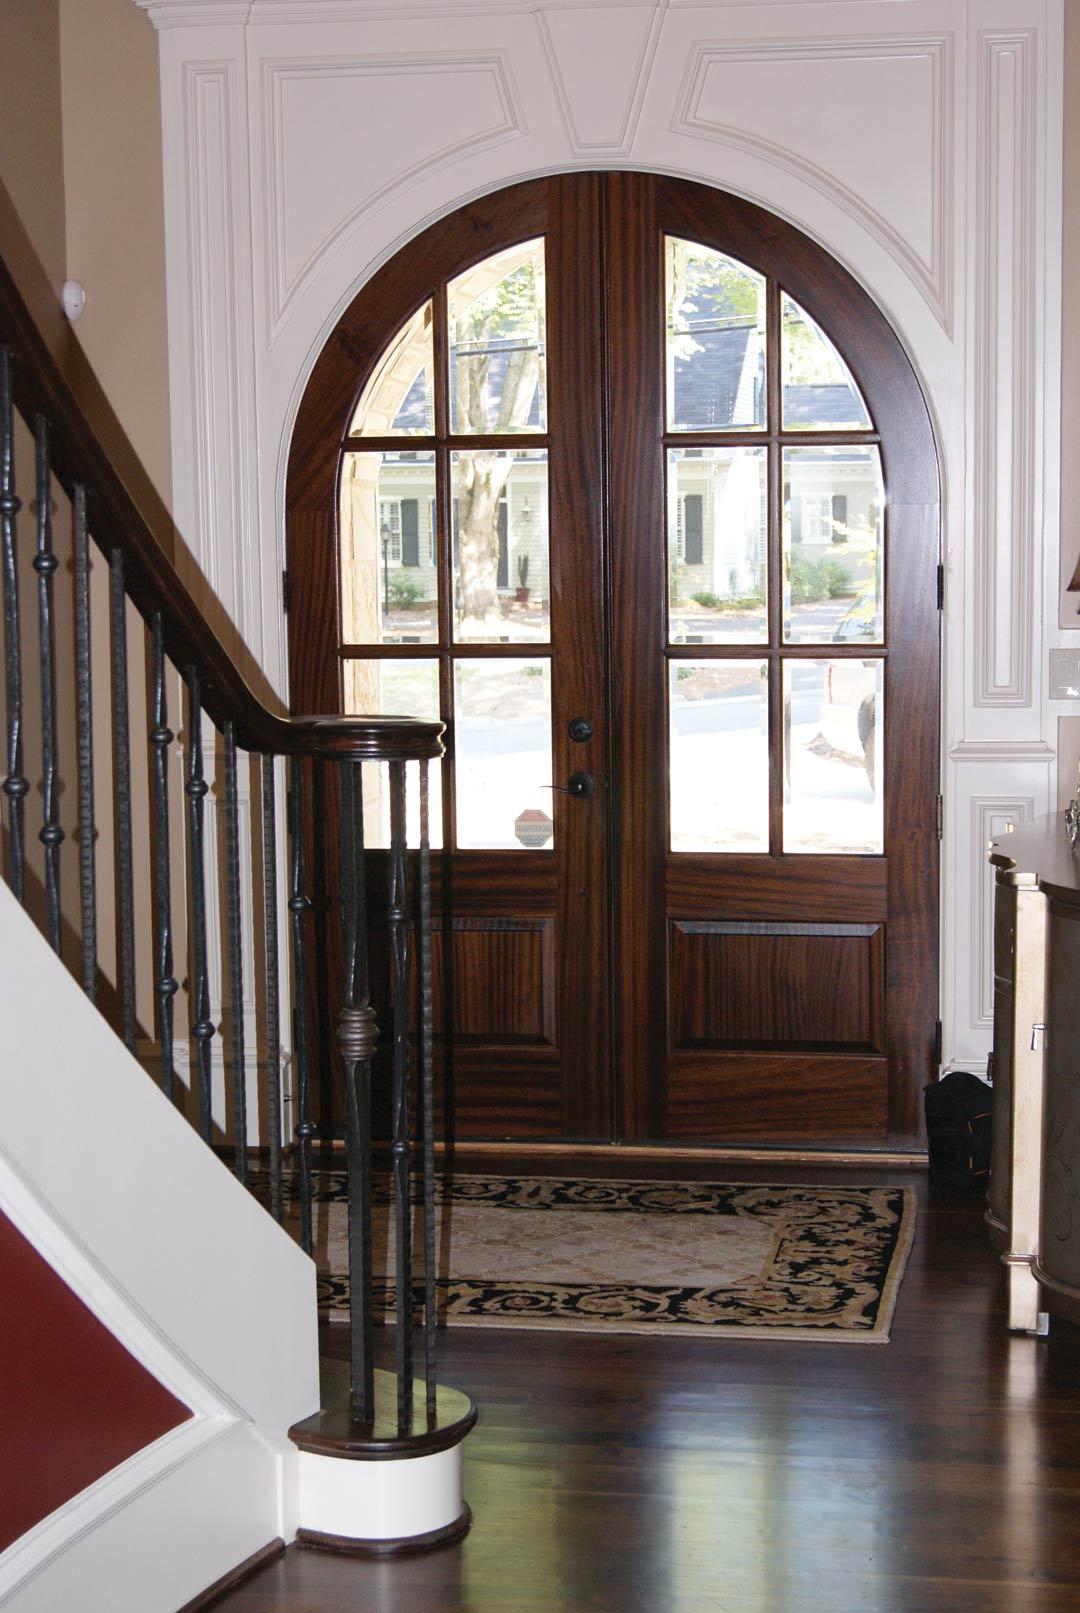 Locked Door Foyer Bonfire : Windows and doors design ideas atlanta home improvement